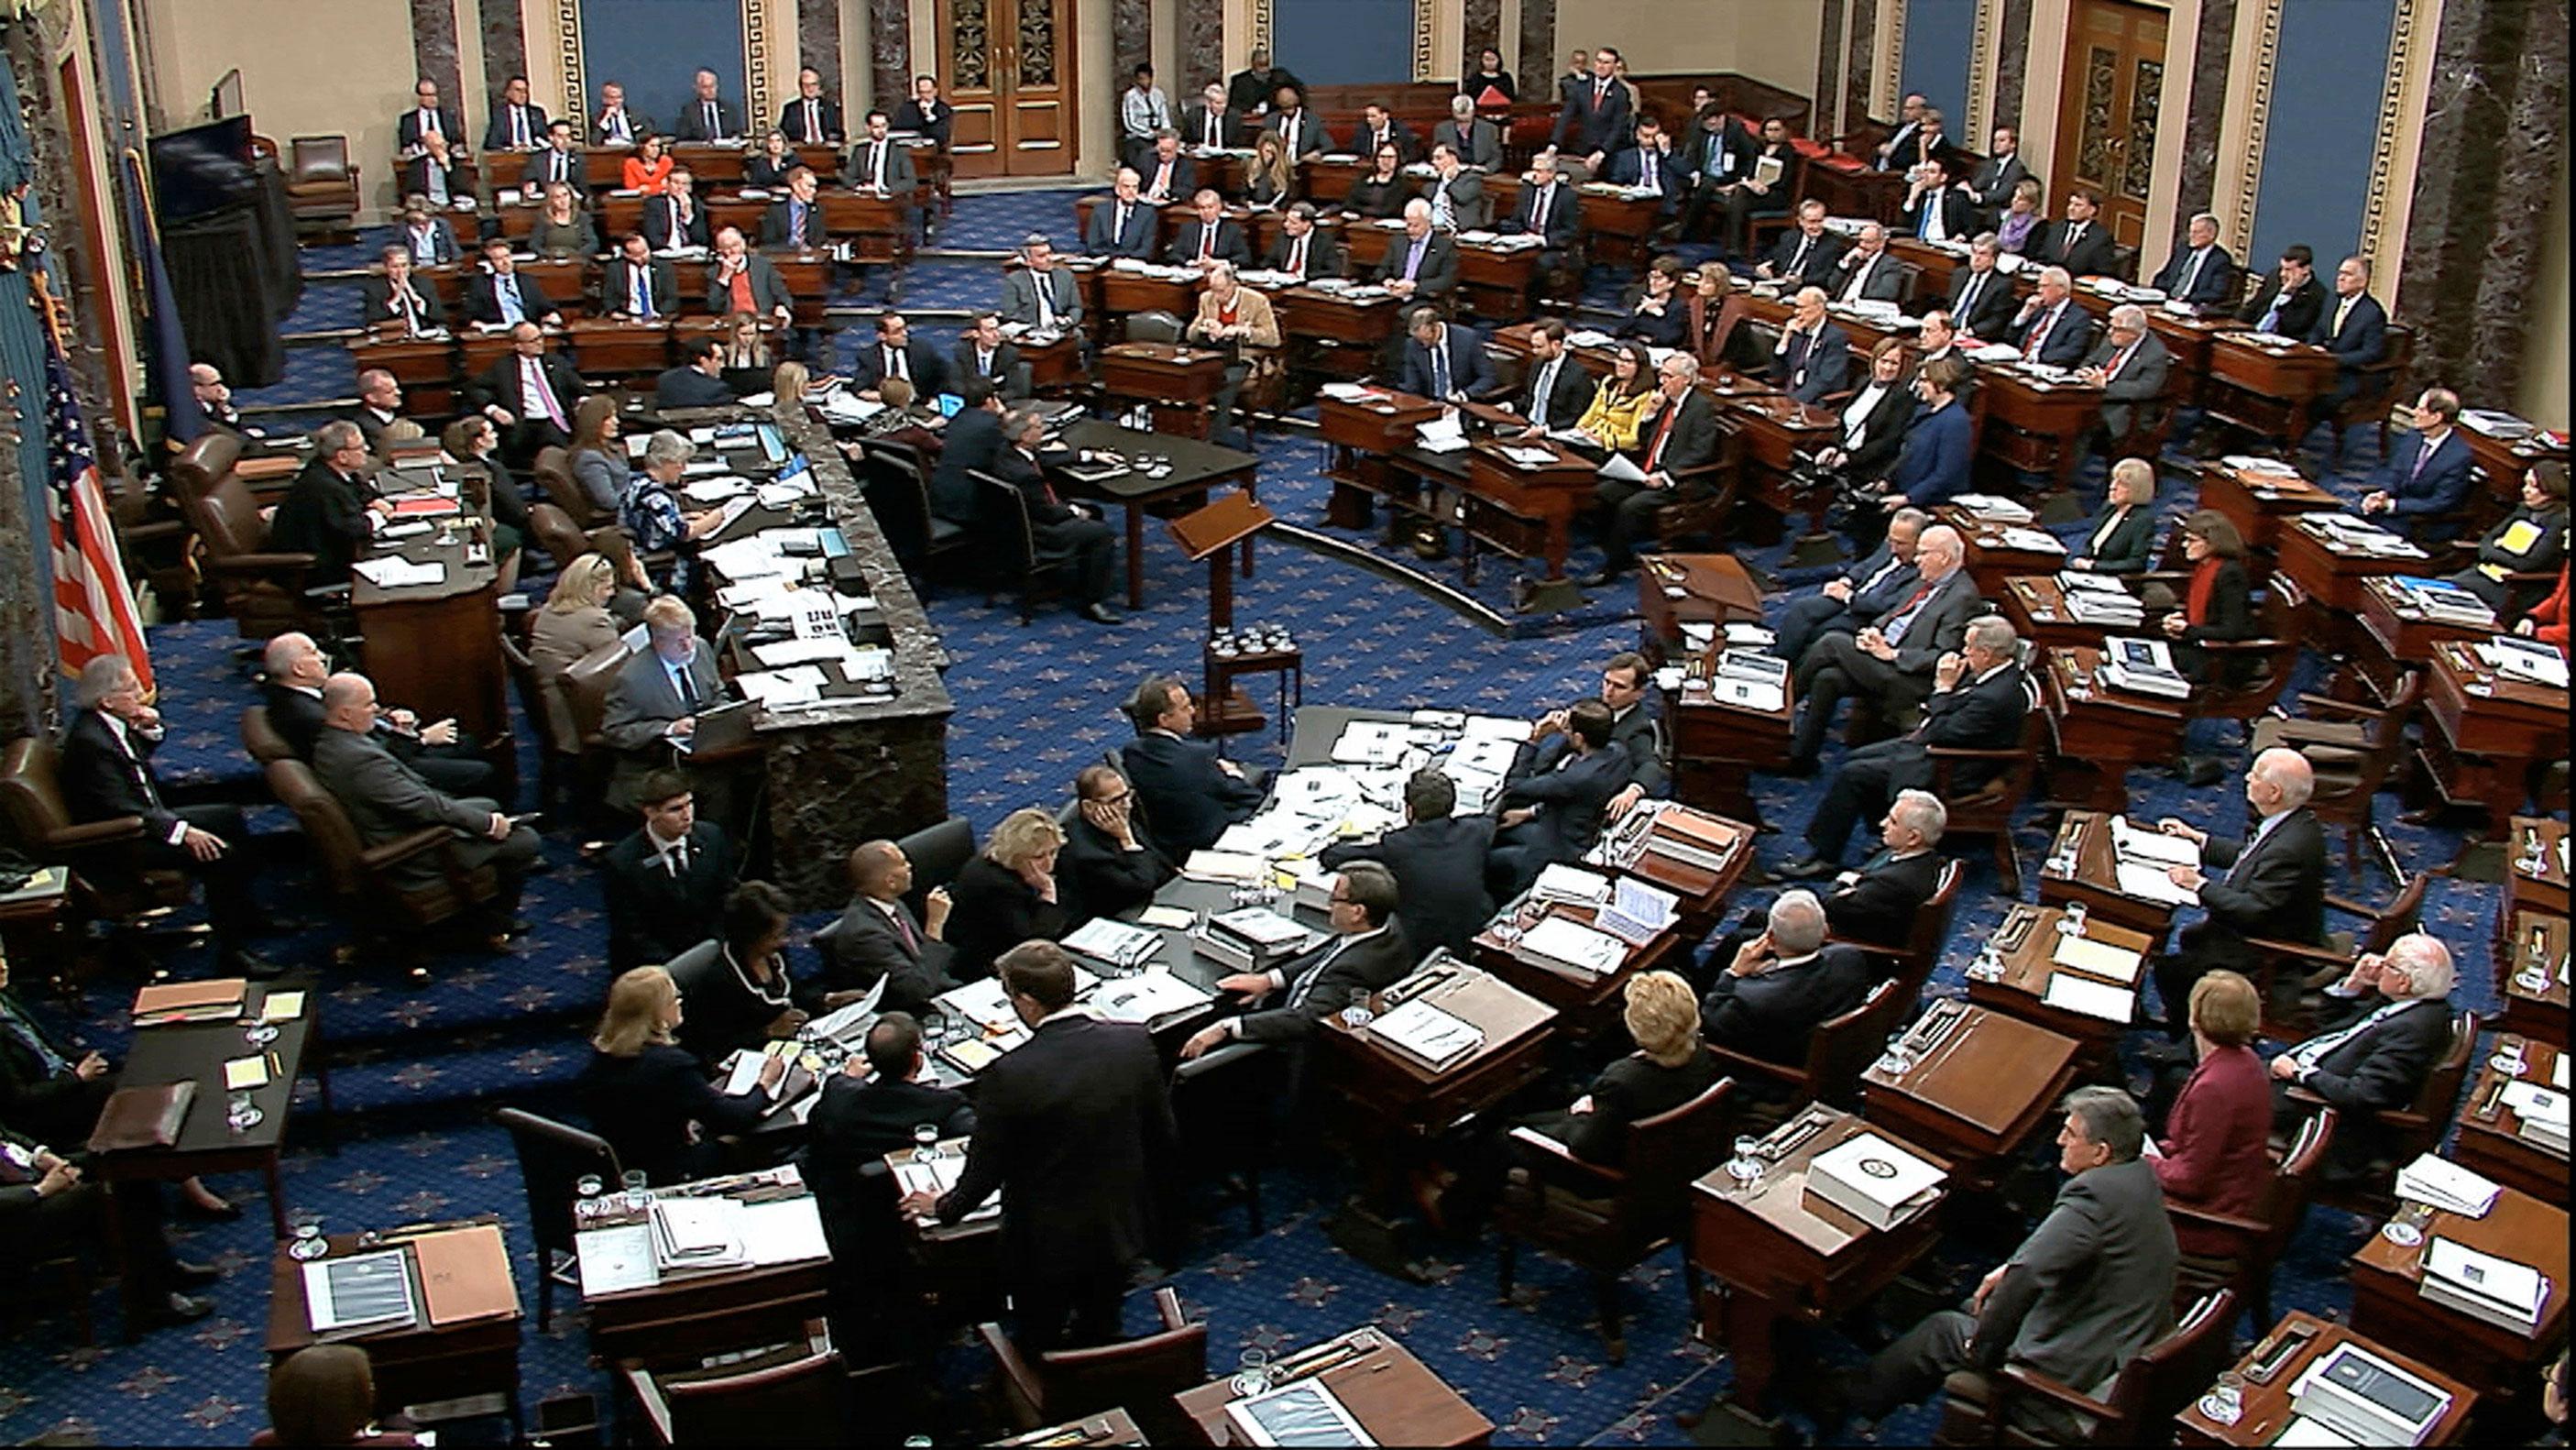 Senate Television via AP